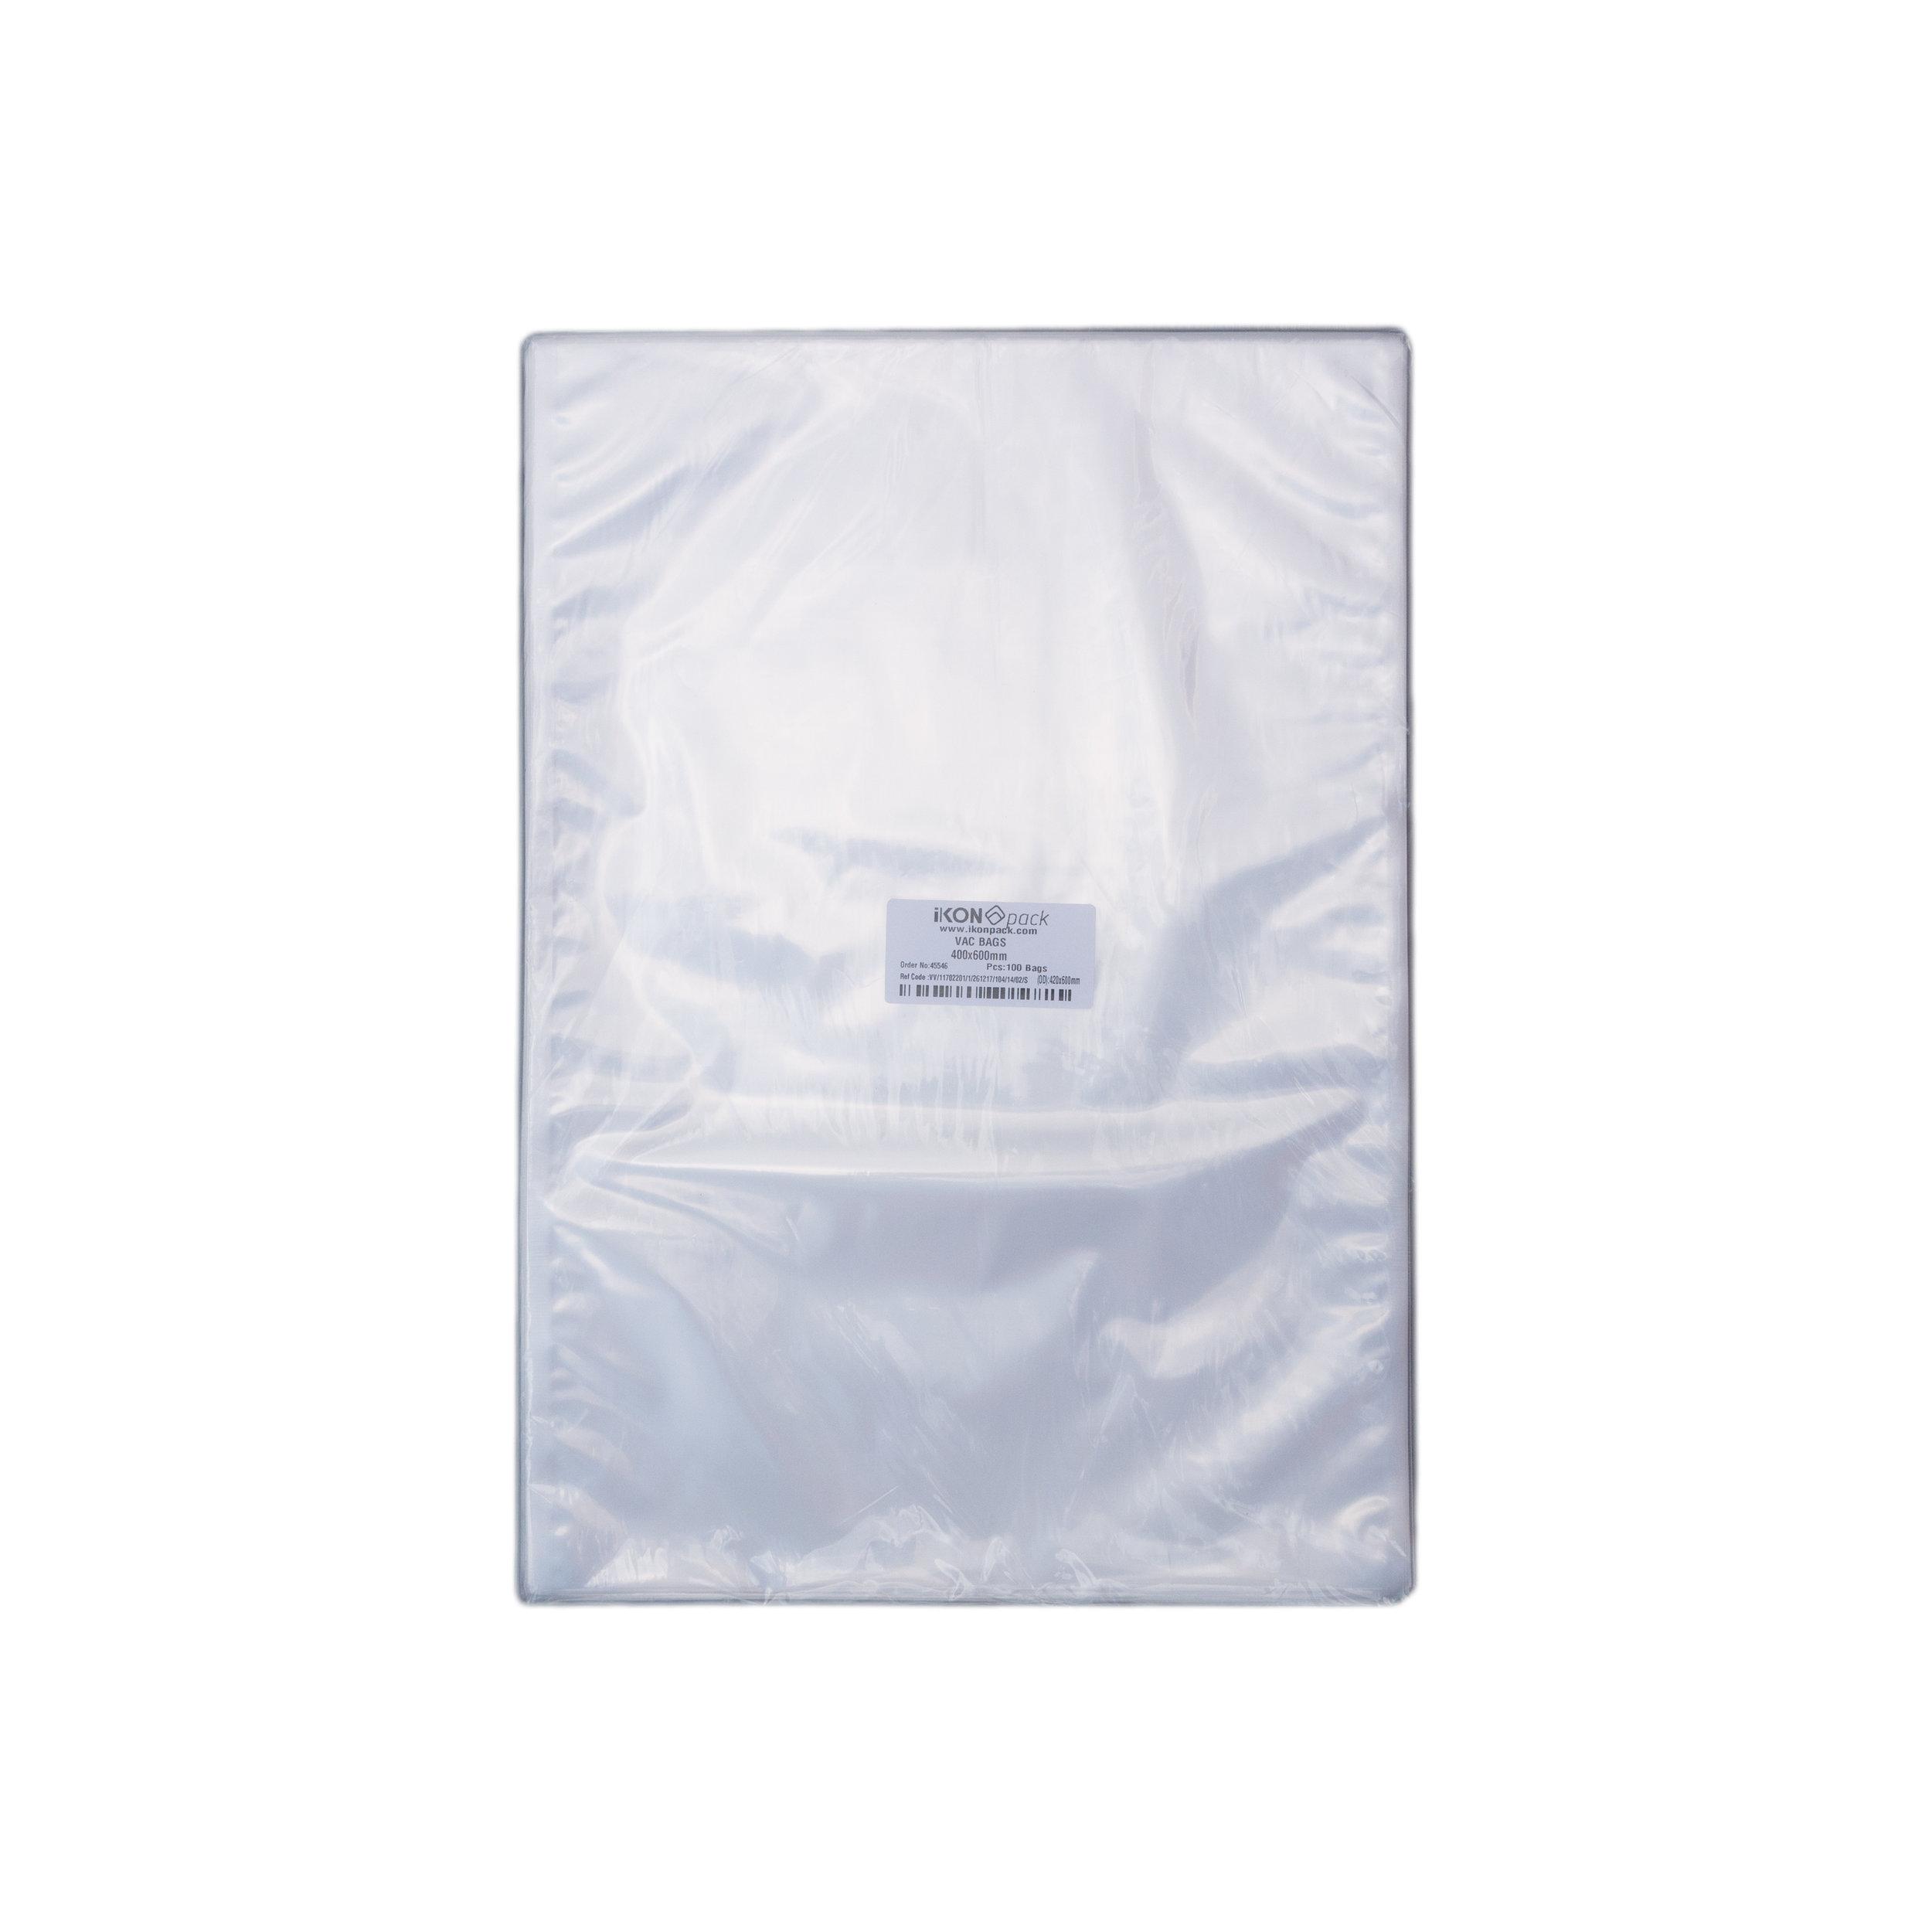 iK-VAC4060      VACUUM POUCH 70 MICRON 400X600    100 per slv 500 per carton